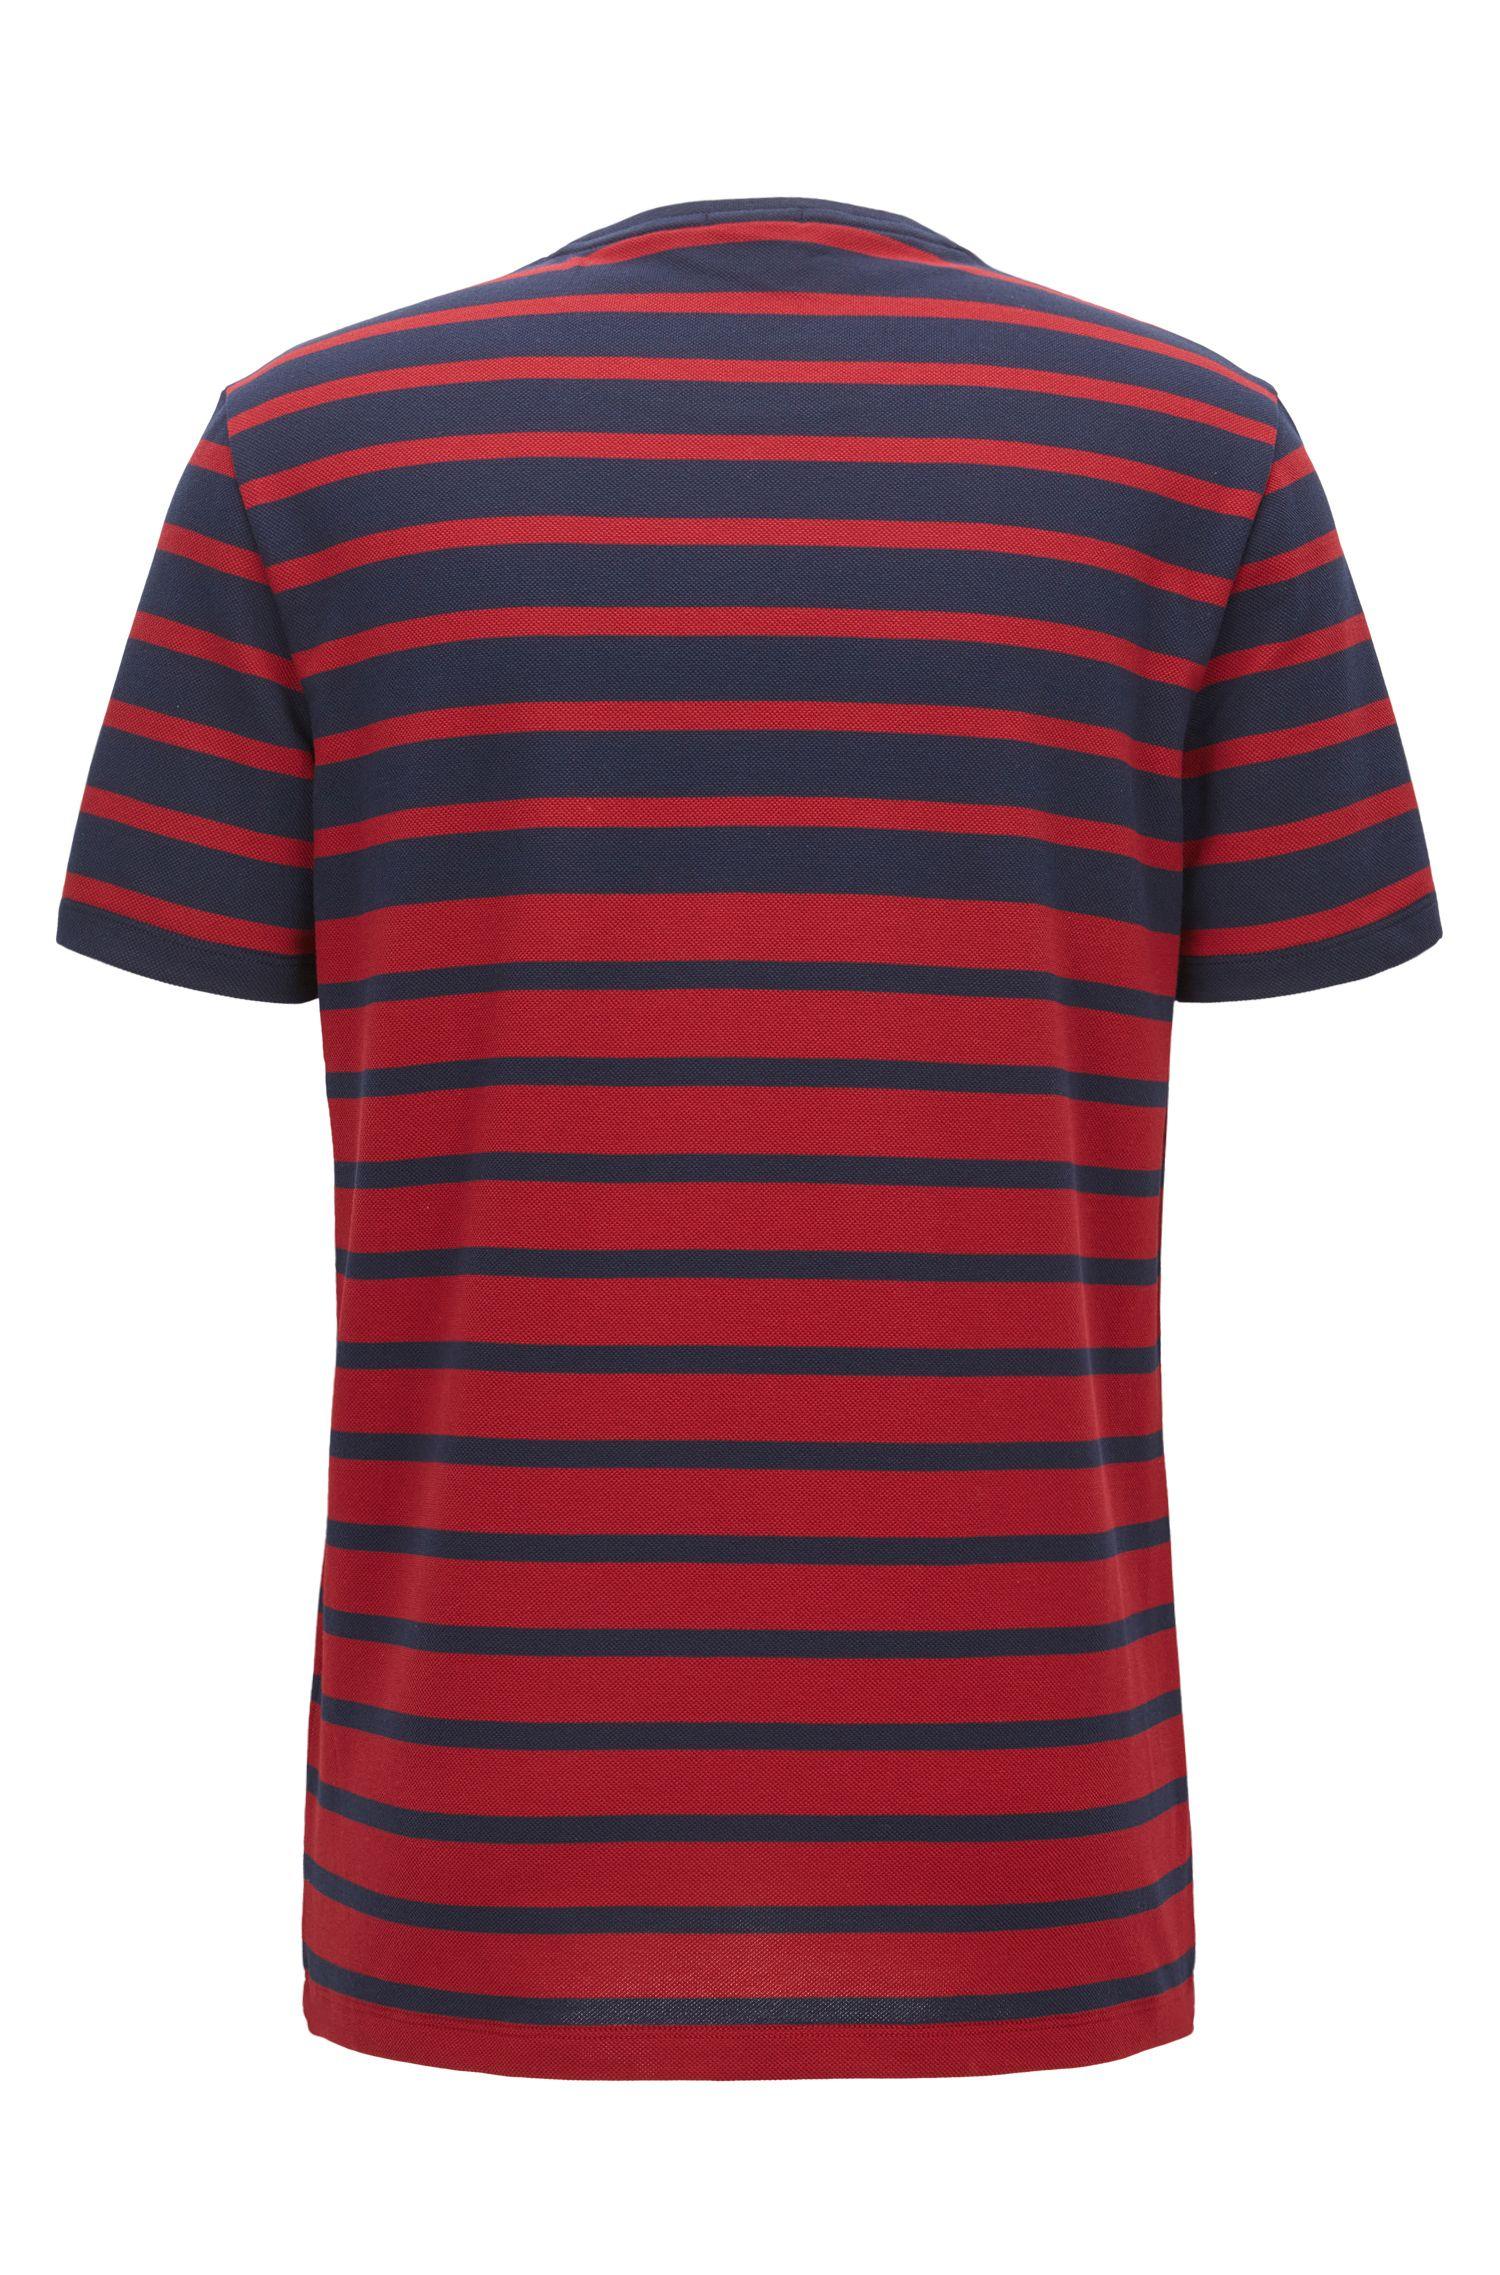 Striped Cotton T-Shirt | Tiburt